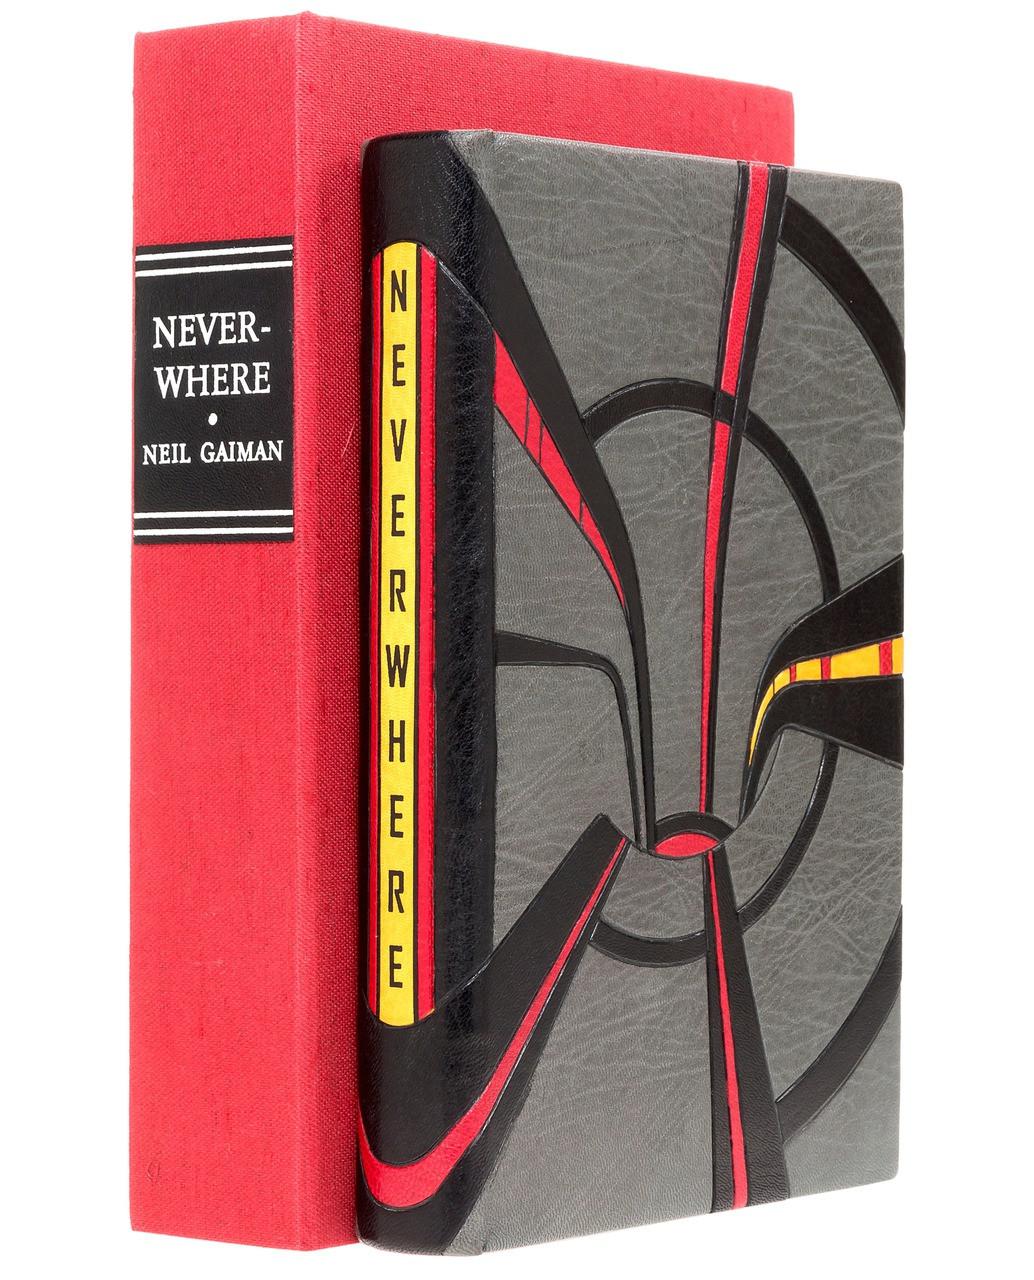 Neverwhere by Neil Gaiman, Unique Award Winning Binding by Scott Kellar